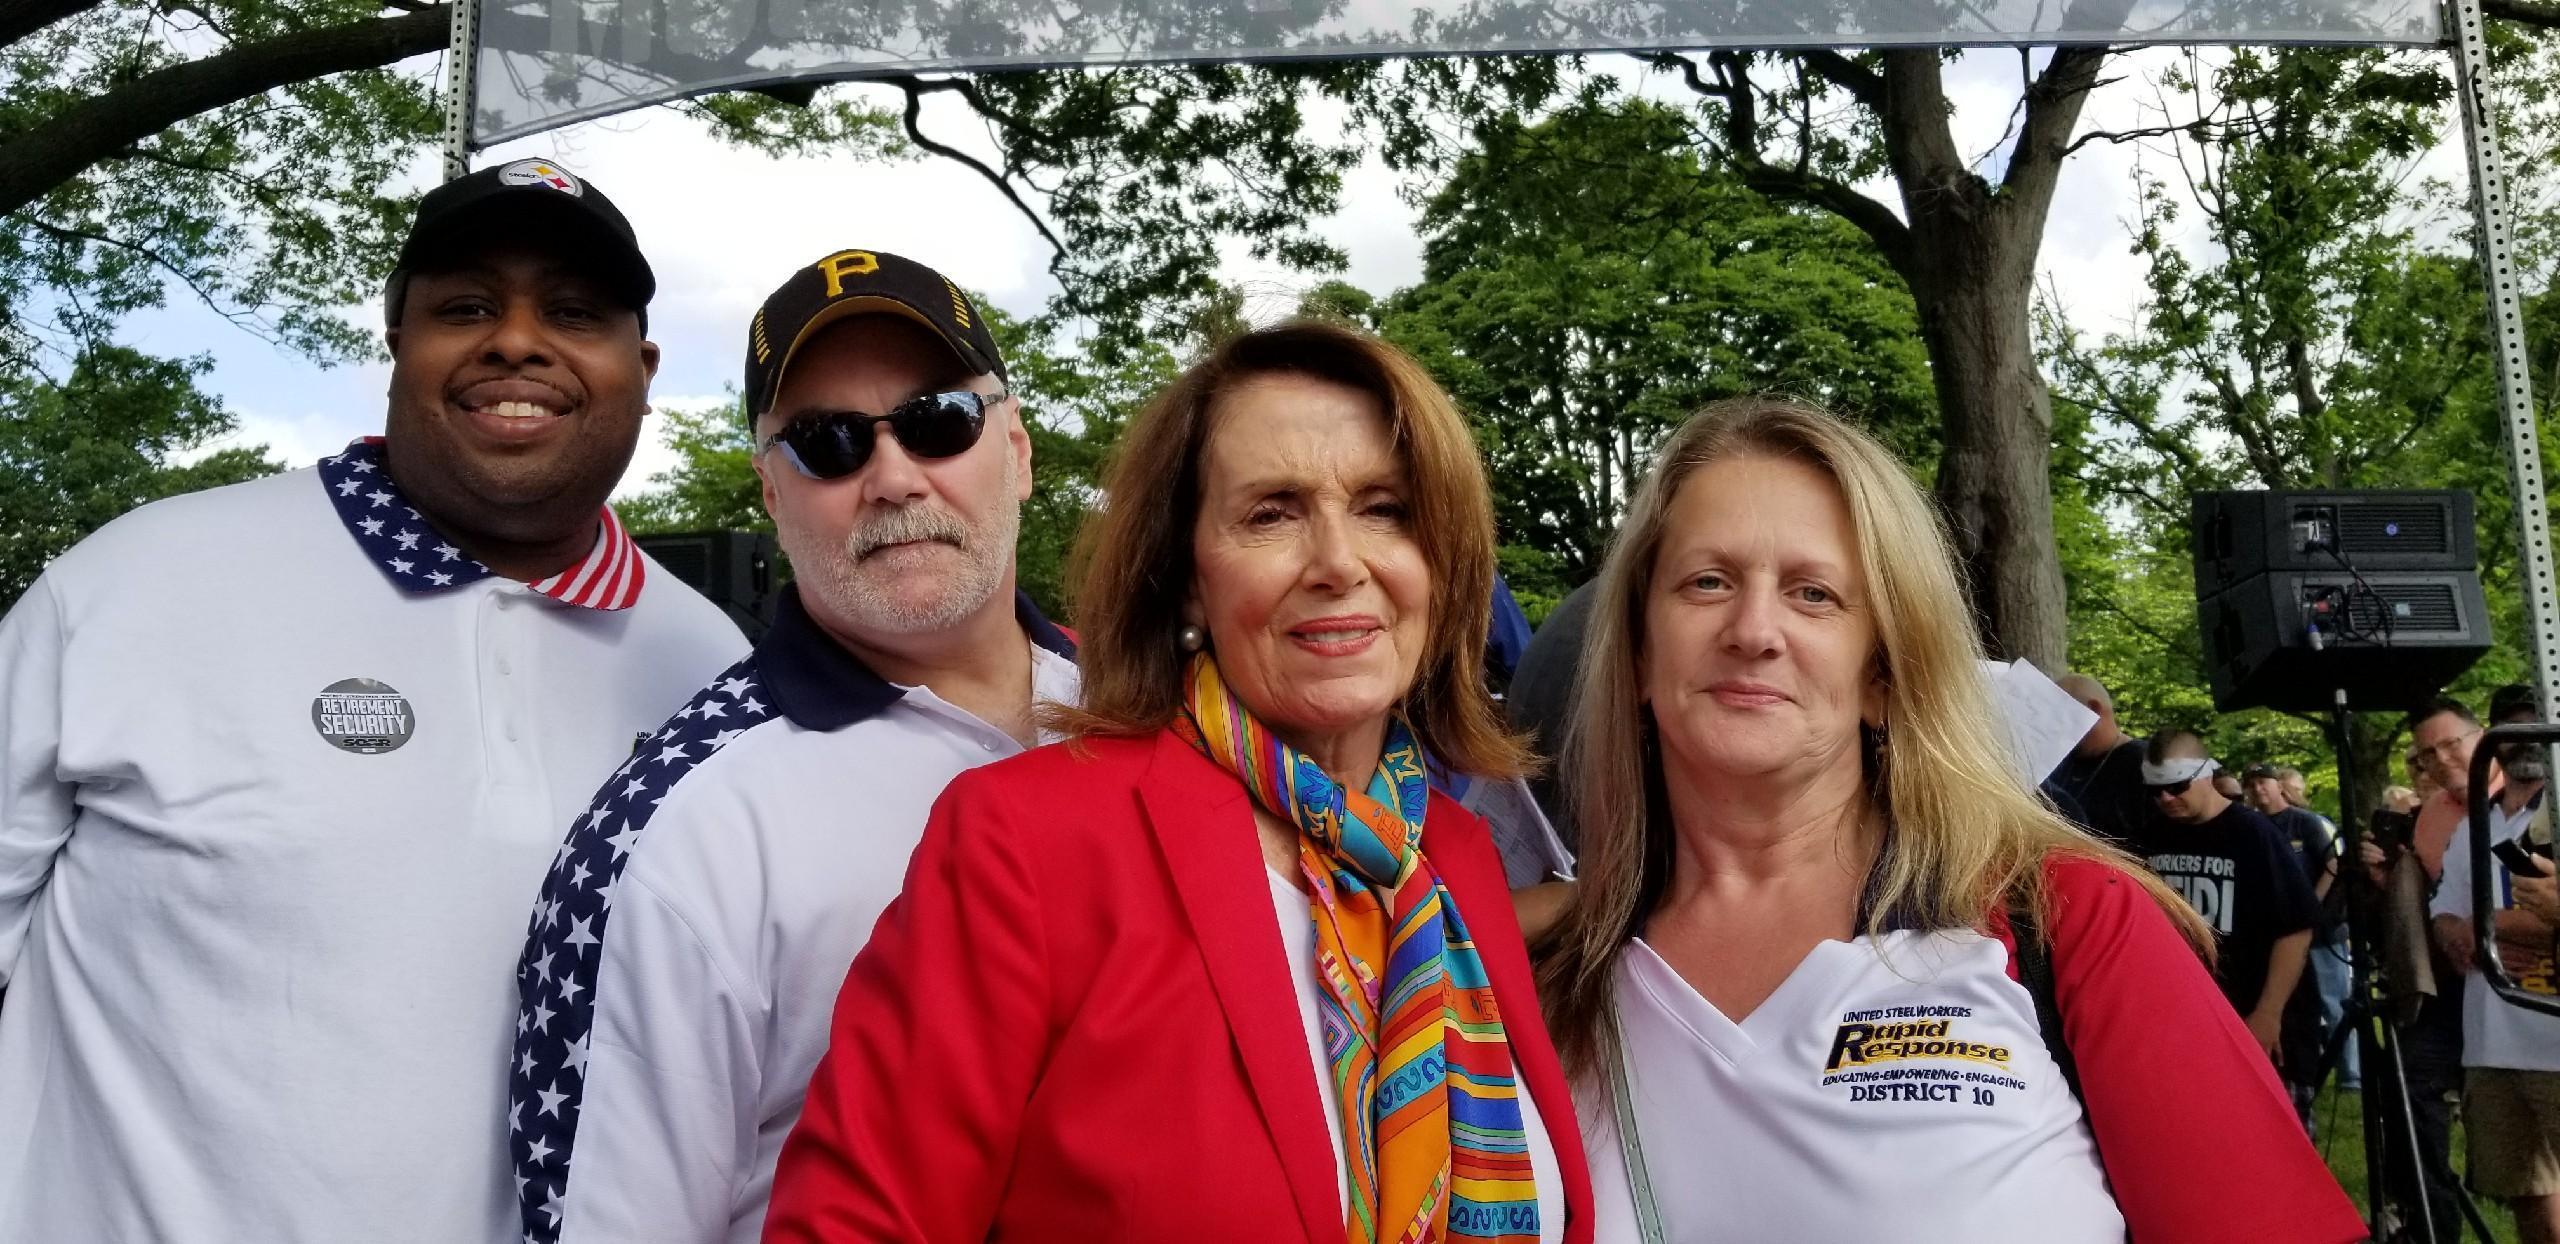 Derick Gee, Don Jackson, Speaker of the House Of Representatives Nancy Pelosi, Keli Vereb